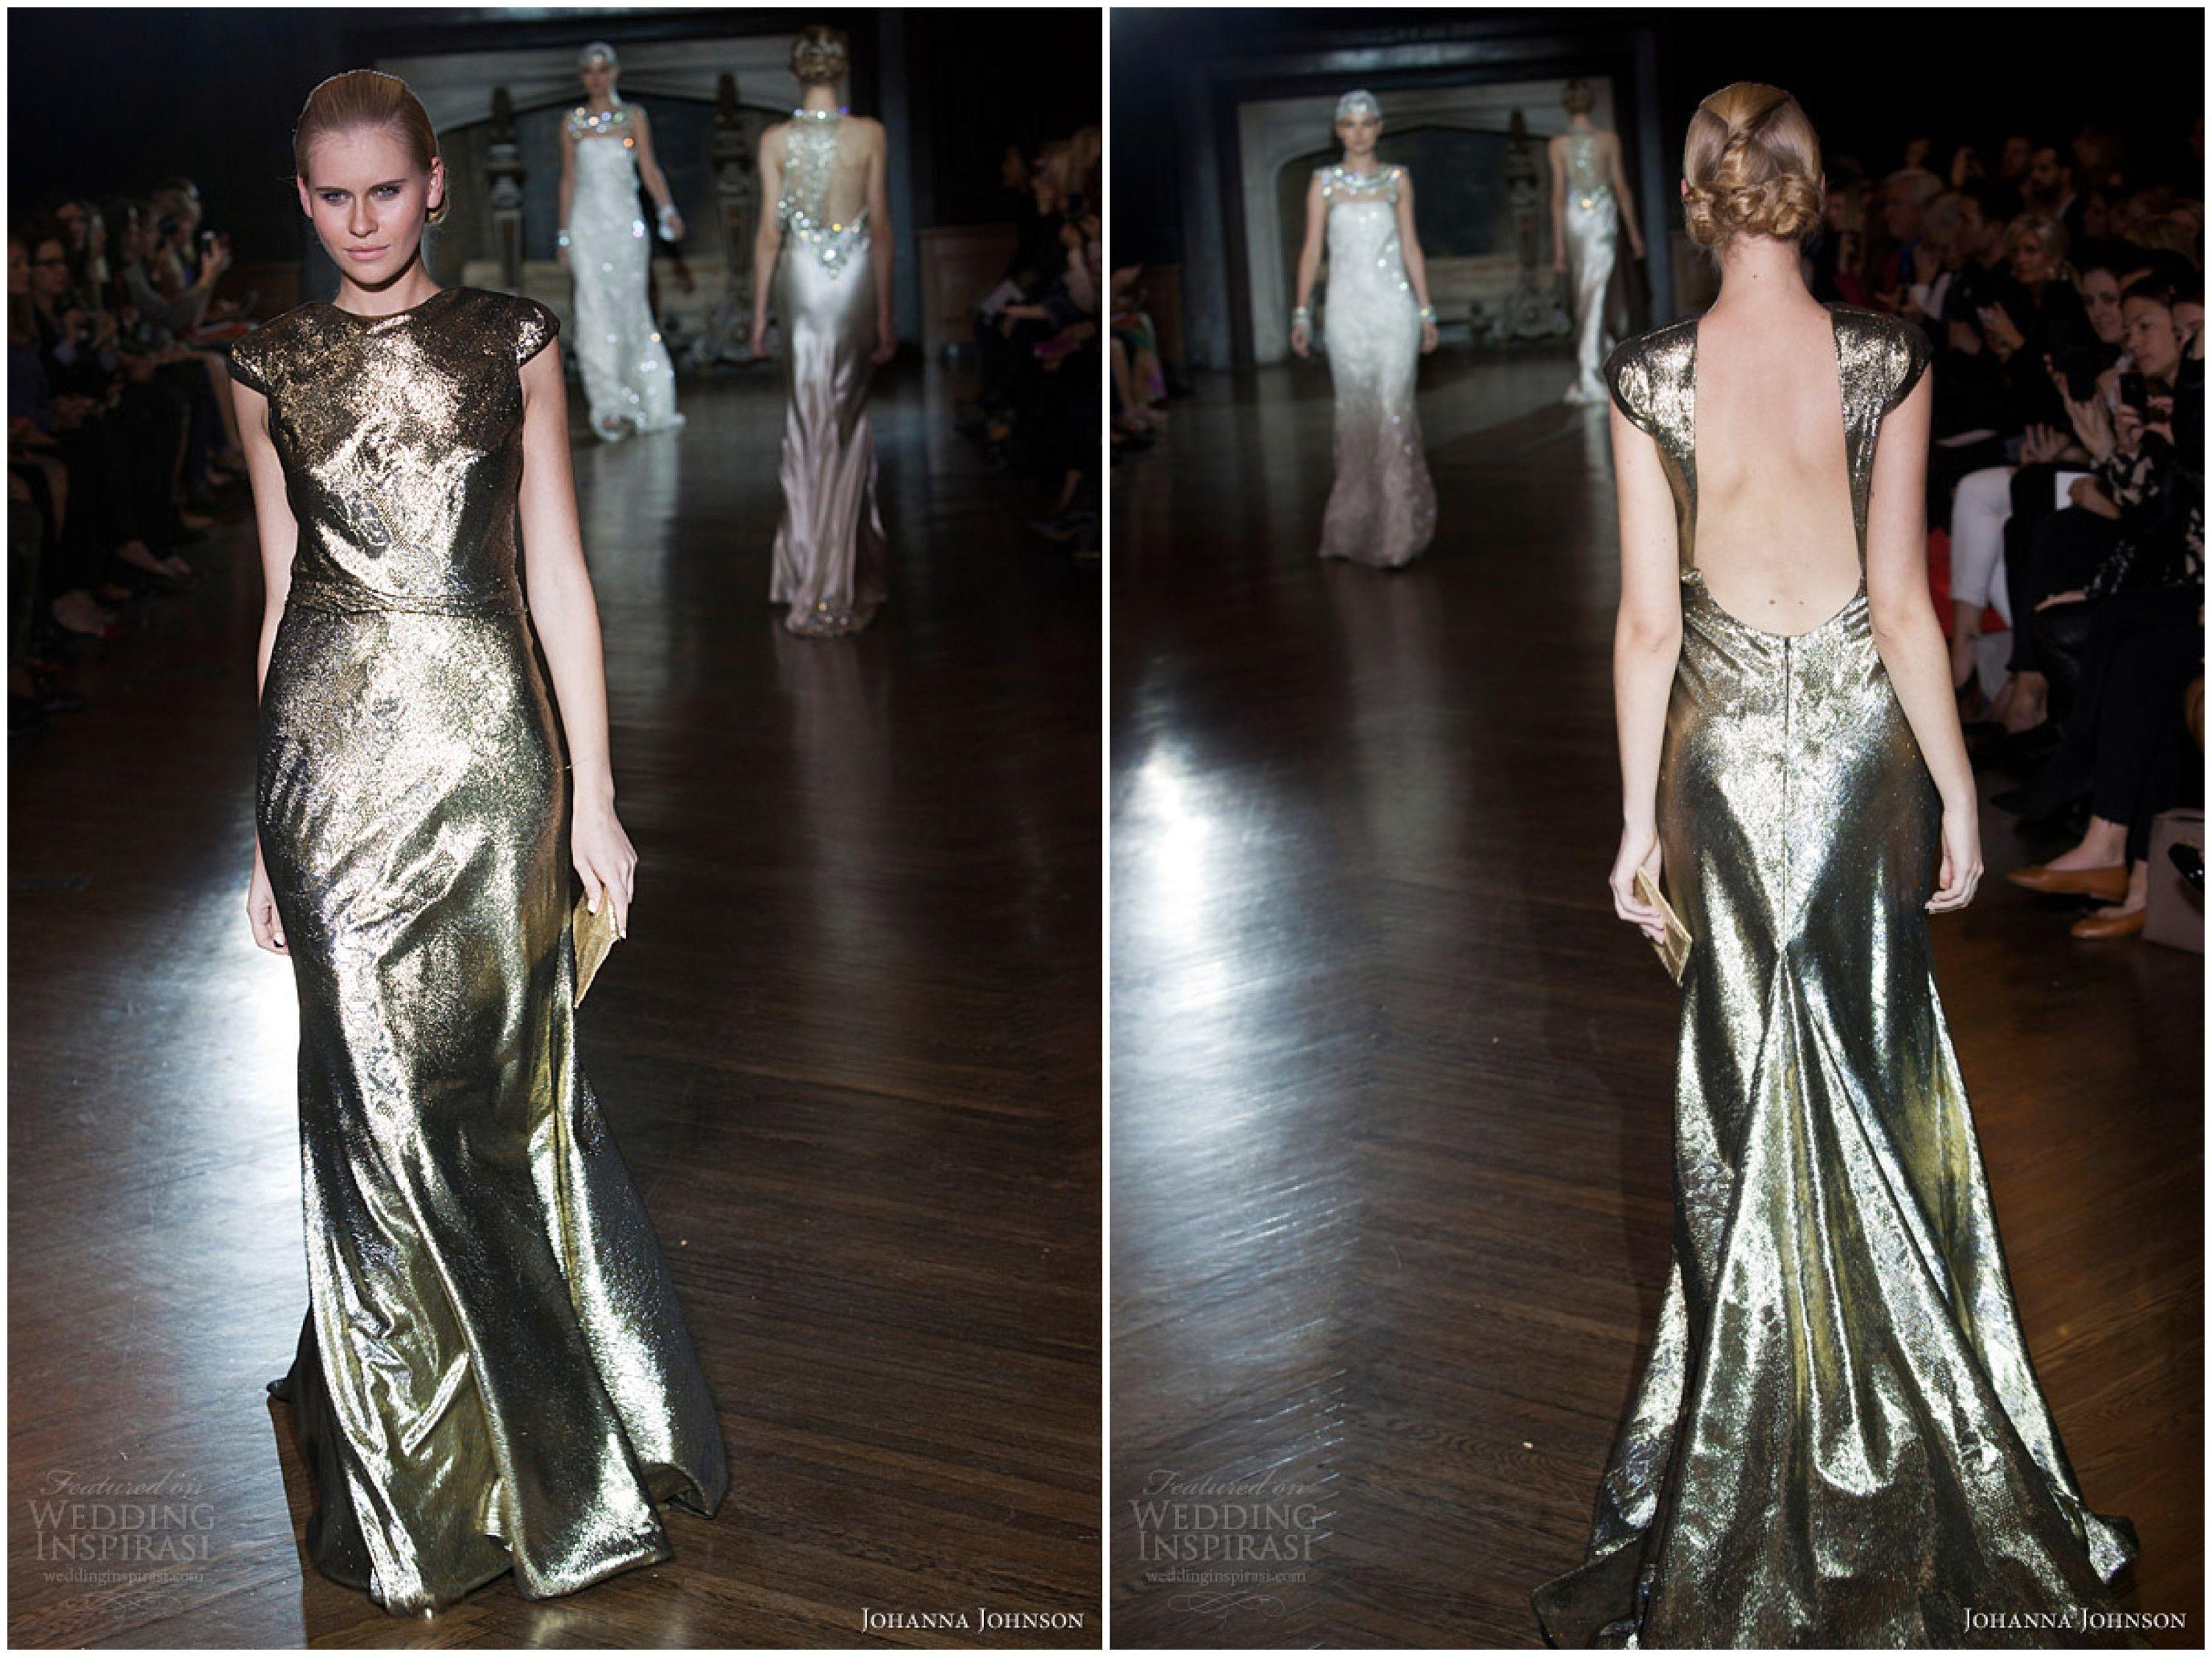 Wedding Inspiration, Metallic Wedding Dresses Johanna Johnson 2014 Muse collection. http://www.pierrecarr.com/blog/2014/06/wedding-inspiration-cfda-fashion-awards-2014/ #PierreCarr #MetallicWeddingDresses